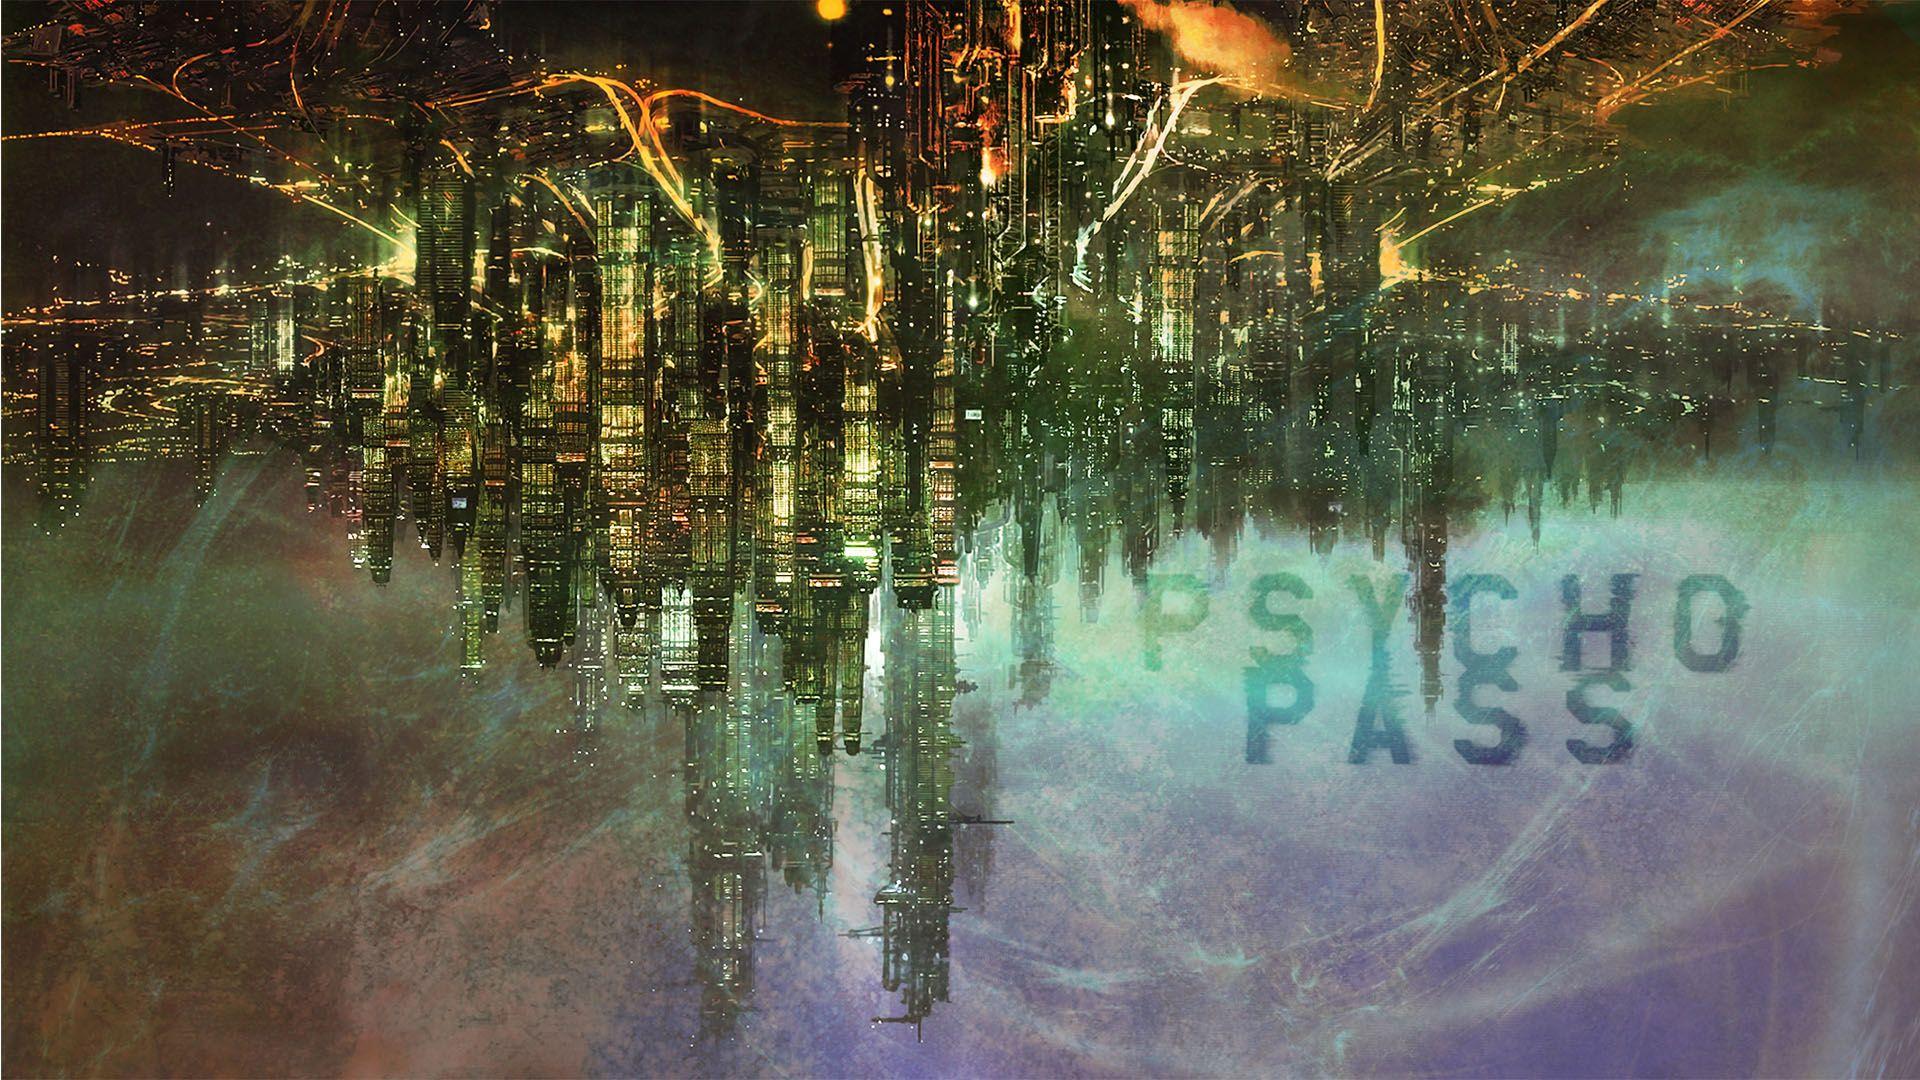 Psycho Pass Background Wallpaper HD